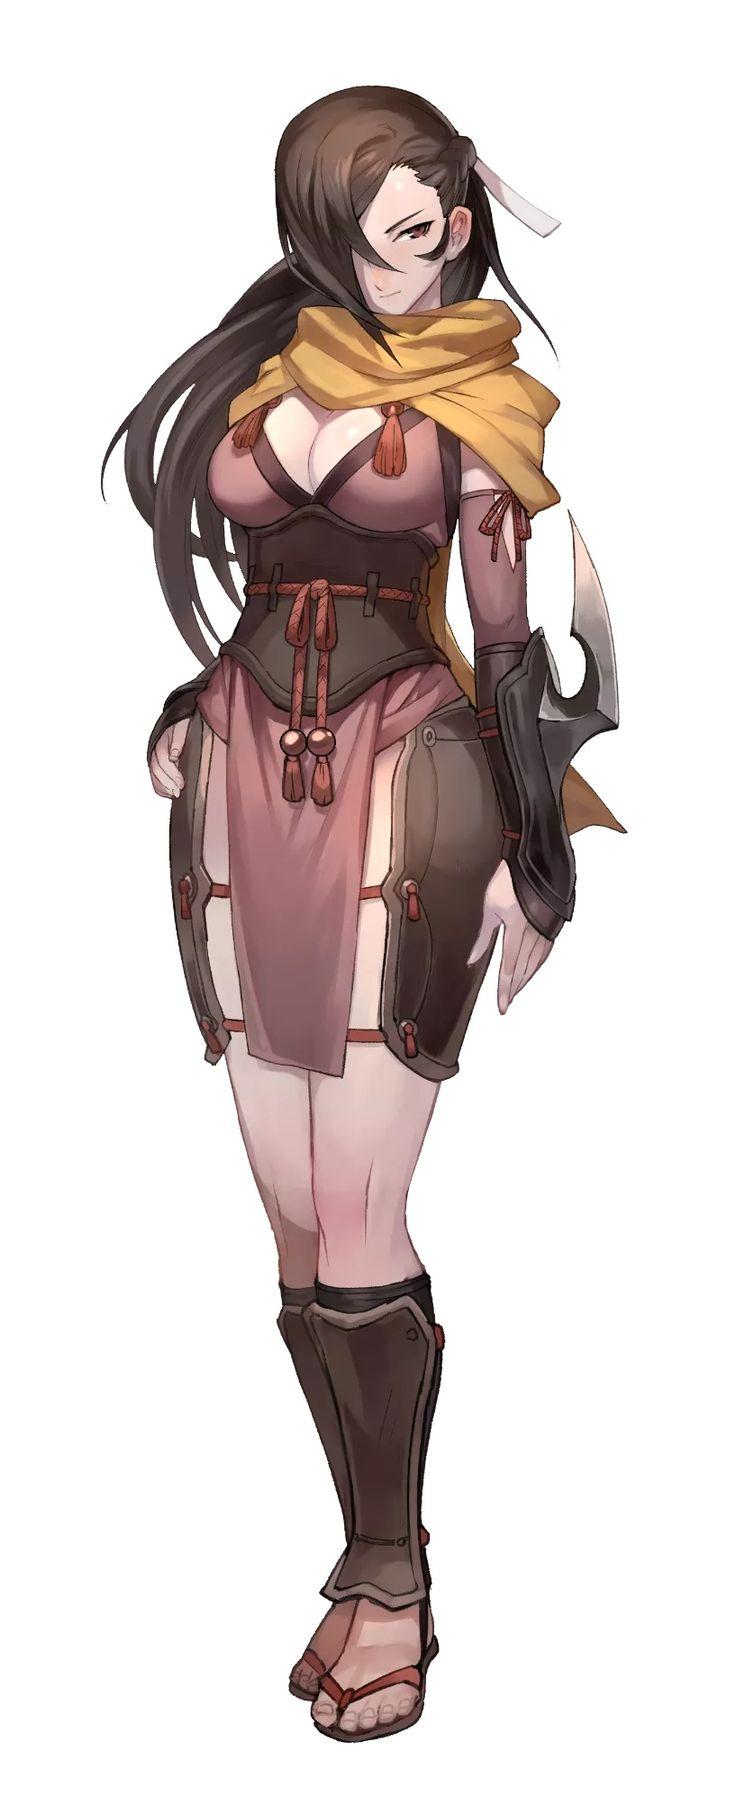 Kagerou / Fire Emblem Heroes